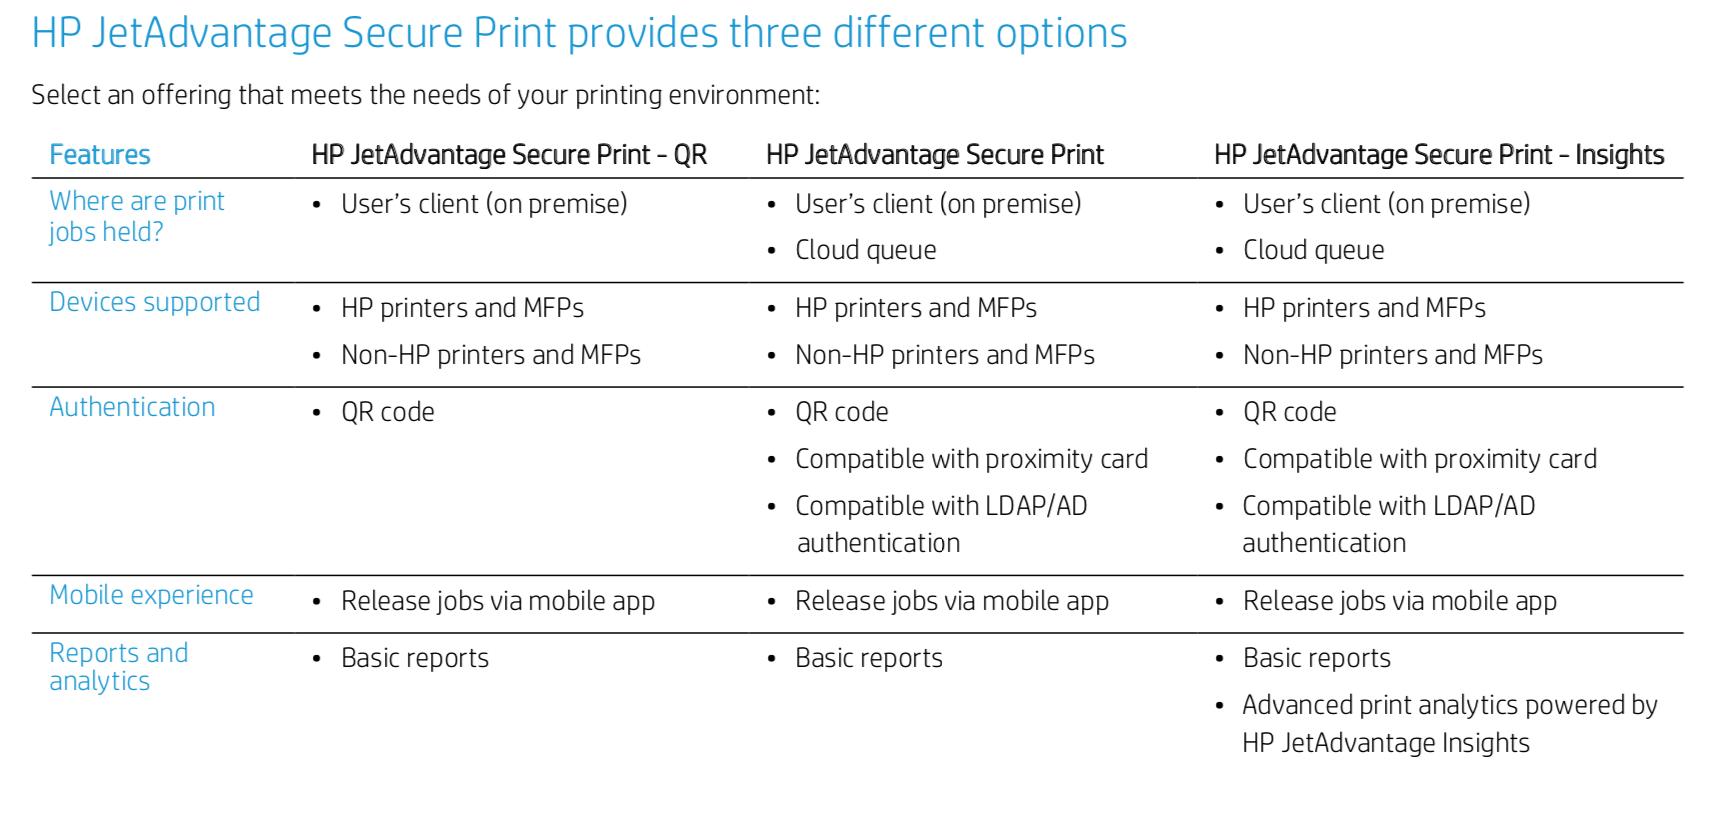 HP JetAdvatage Secure Print provides three different options